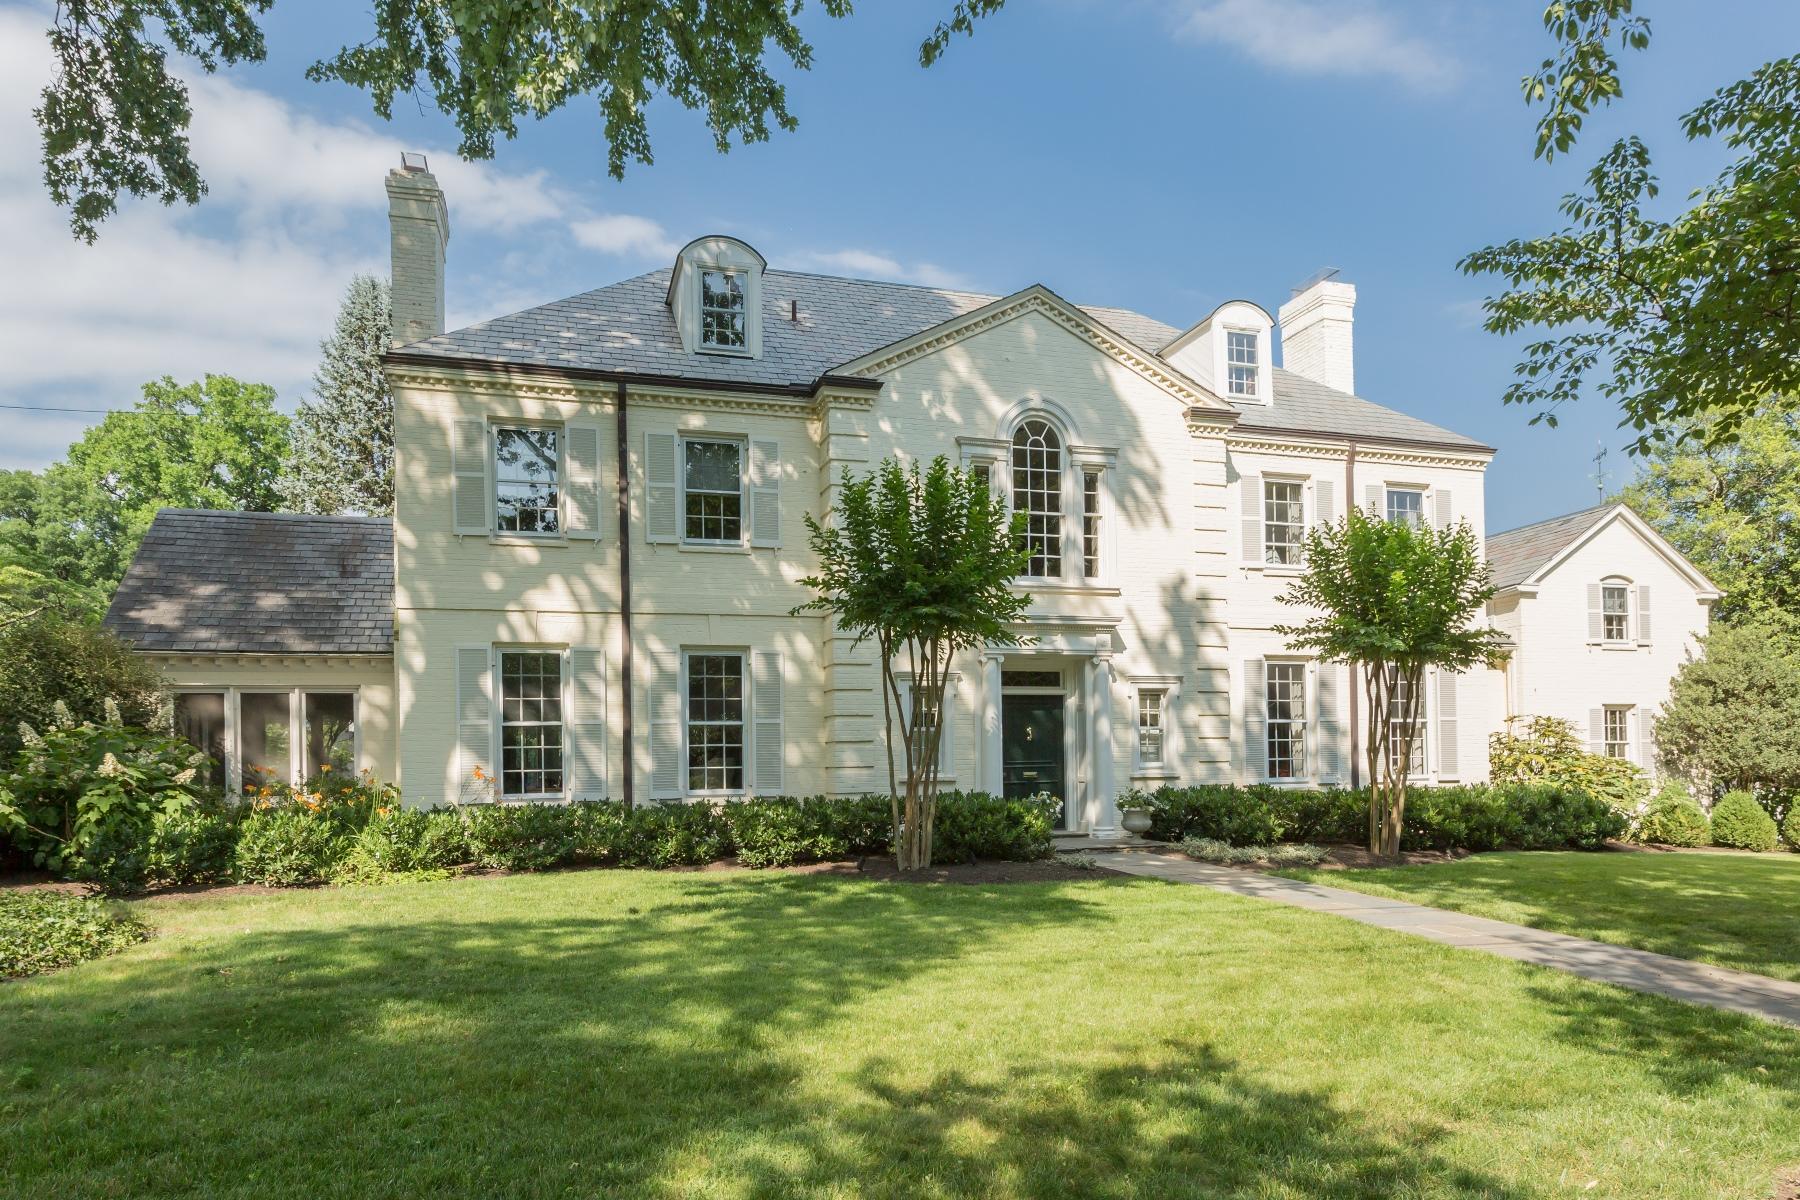 Villa per Vendita alle ore 6005 Highland Drive, Chevy Chase Chevy Chase, Maryland 20815 Stati Uniti